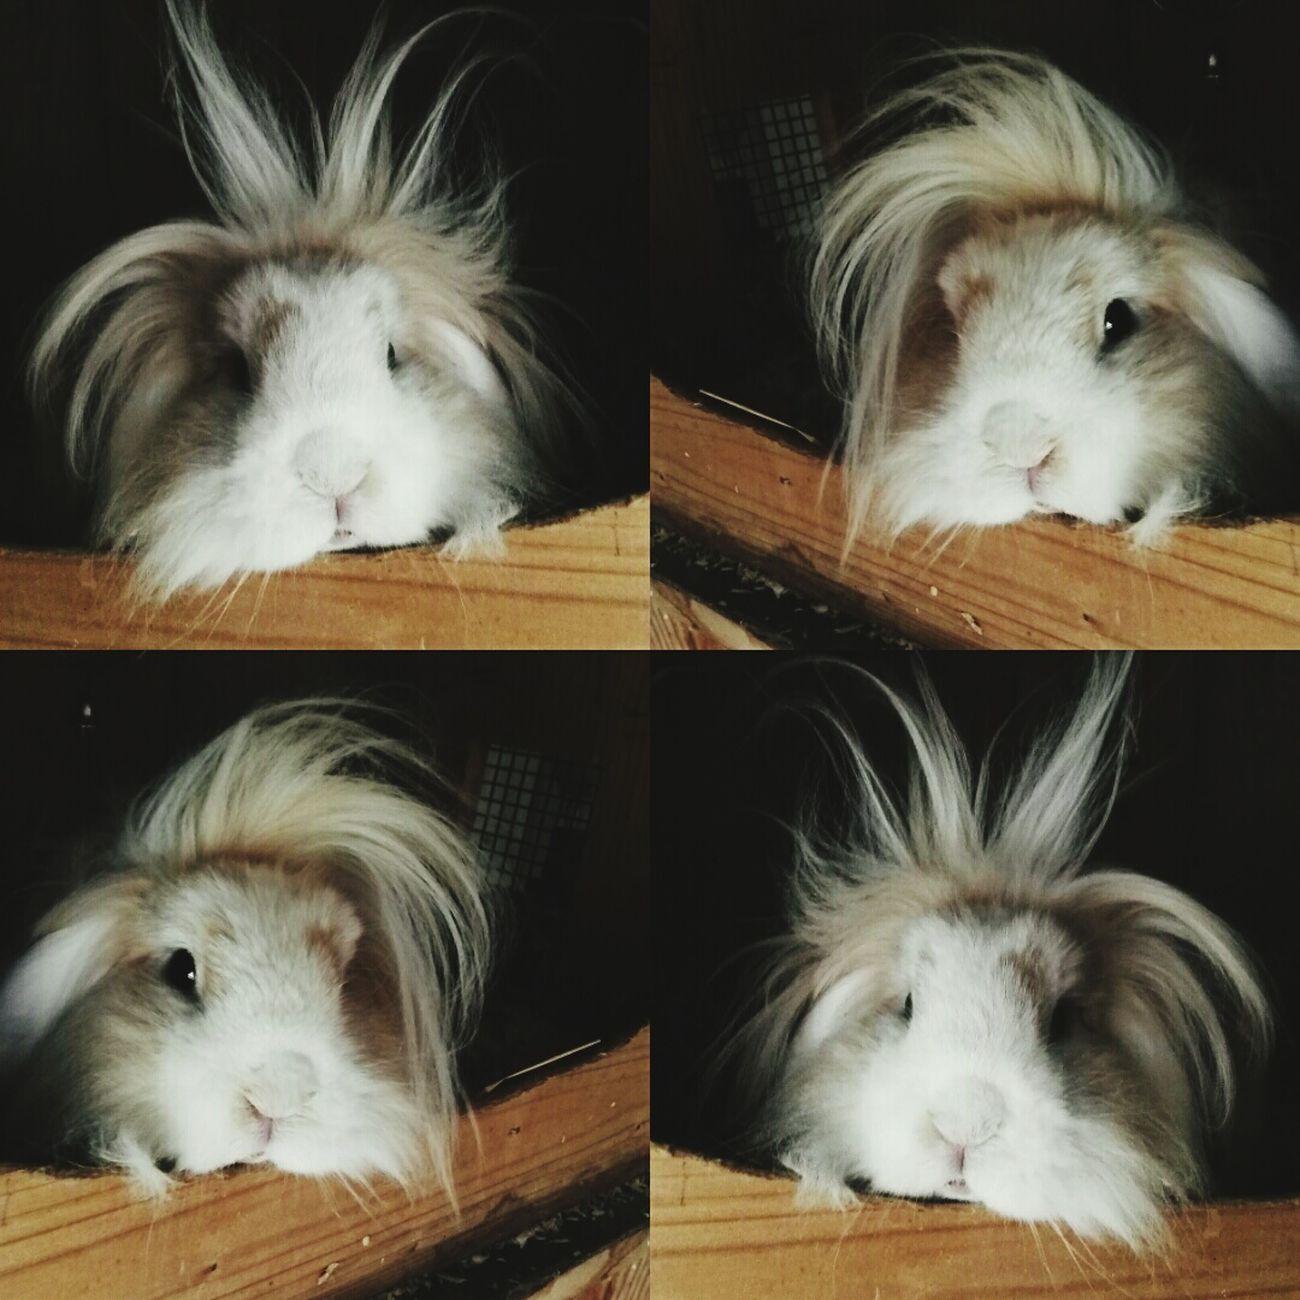 Henry <3 Mybunny Fluffy Cutenessoverload !!